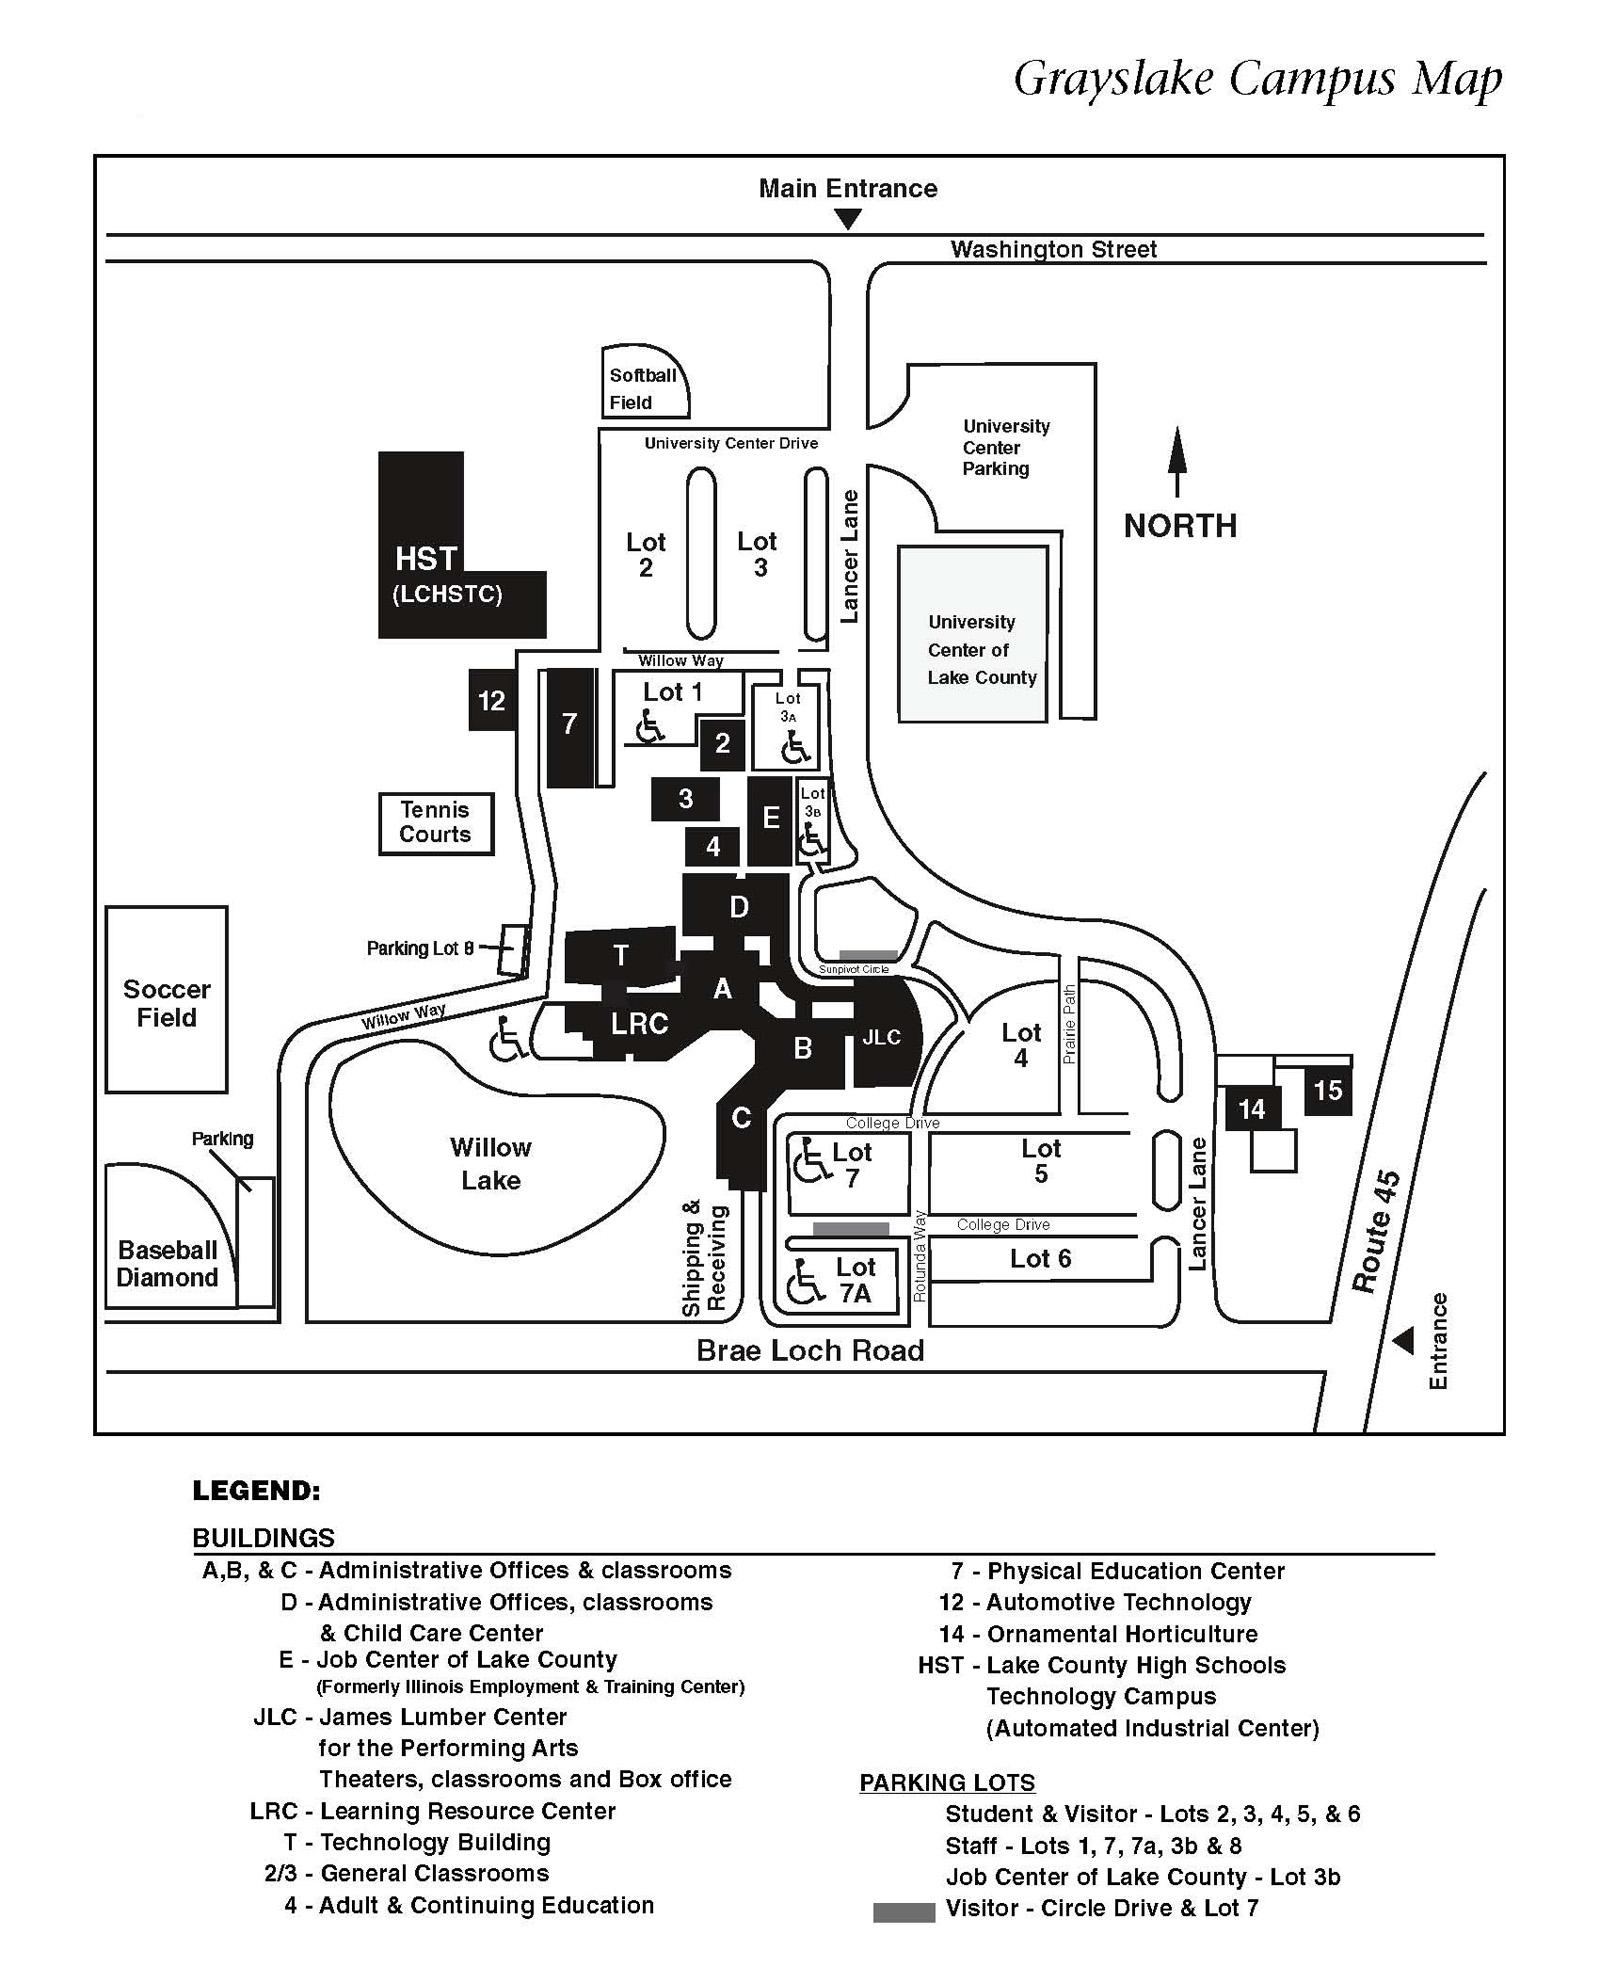 Olivet Campus Map.University Center Of Lake County Map University Center Of Lake